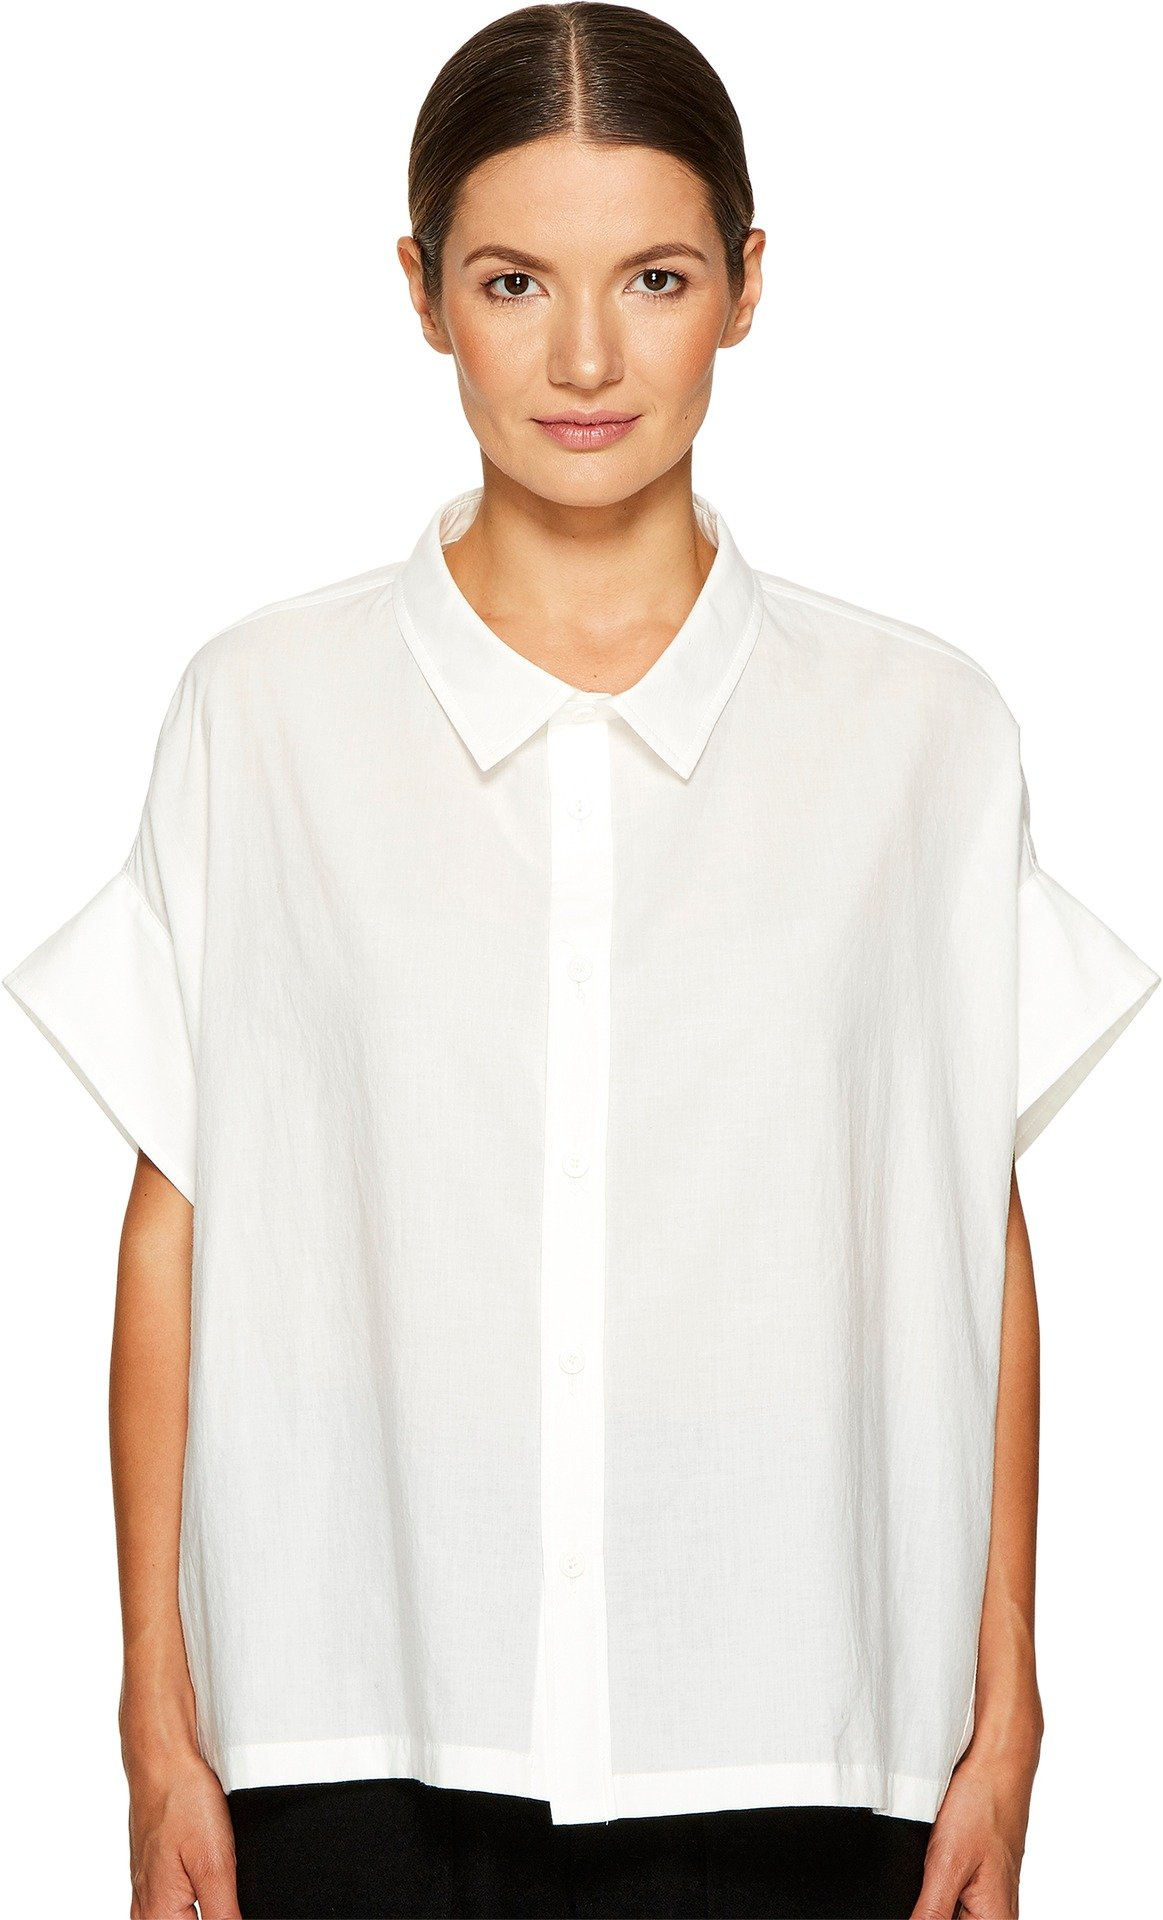 Y's by Yohji Yamamoto Women's Mini Sleeve Short Button Up Top White 2